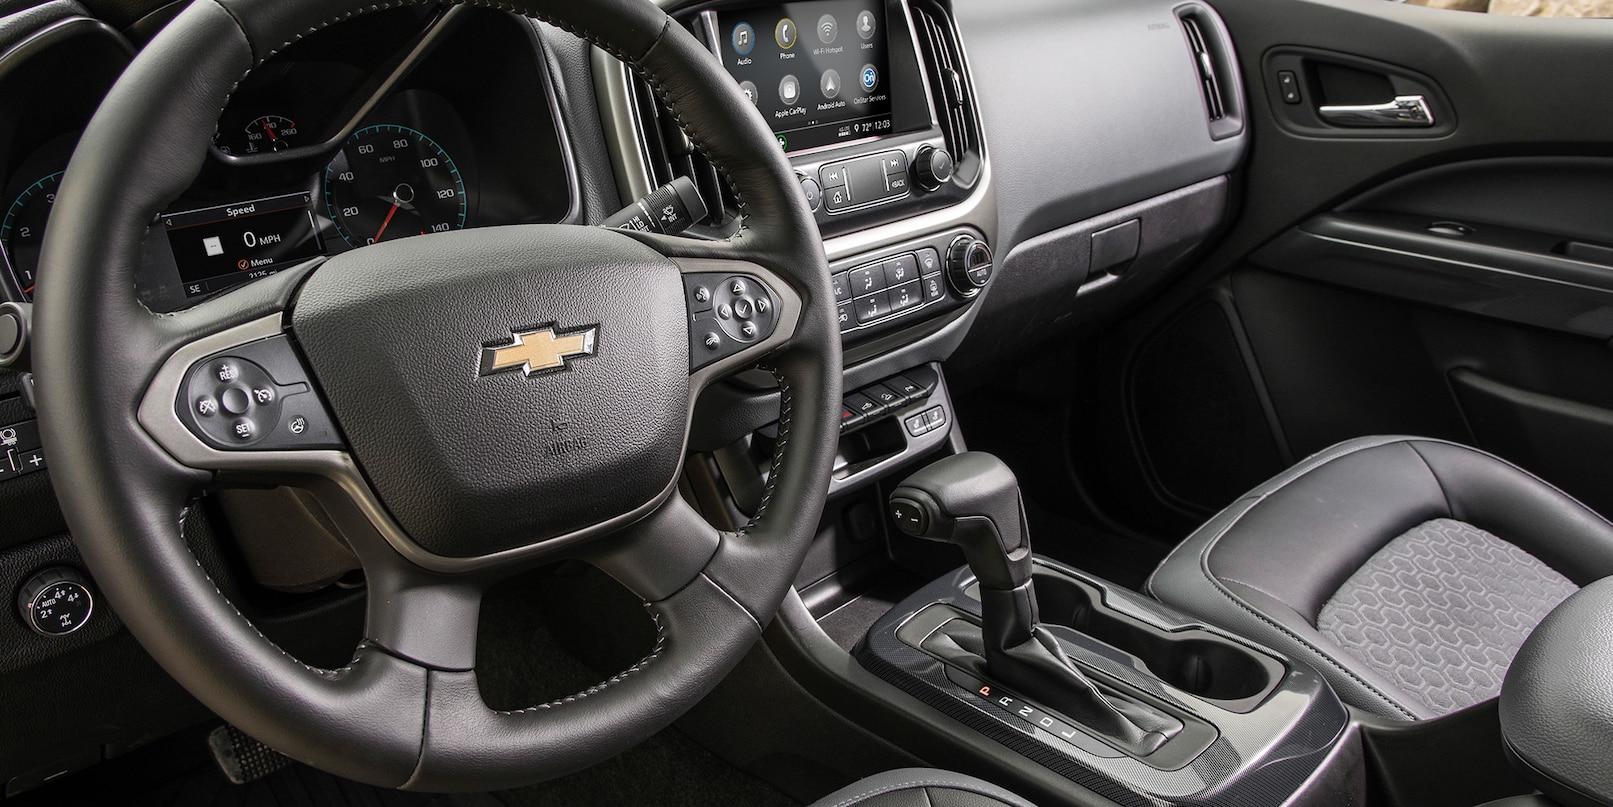 Interior of the 2019 Chevrolet Colorado